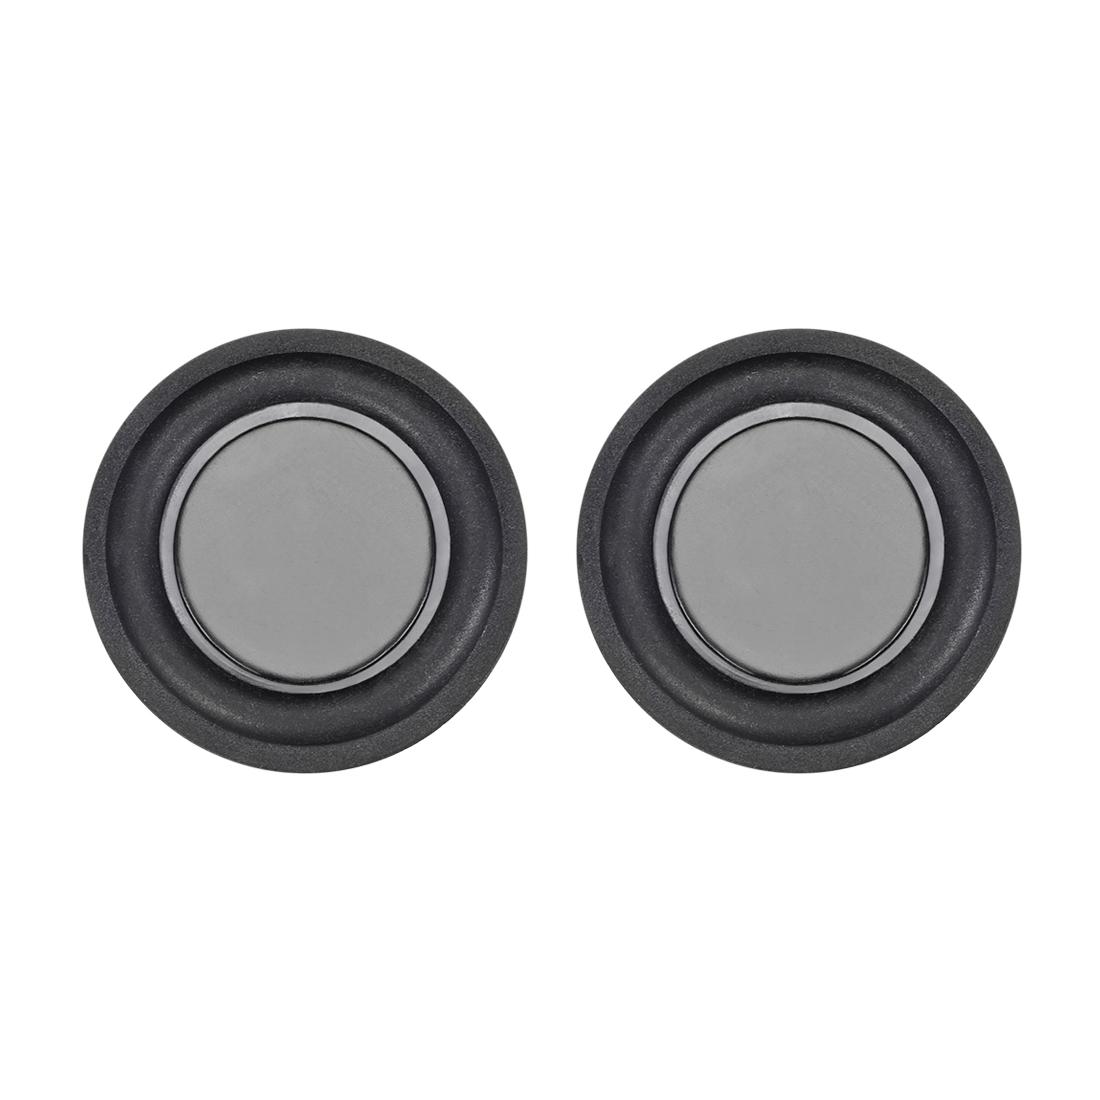 "2Pcs 1.5"" 40mm Bass Speaker Passive Radiator Rubber Vibration Plate DIY Repair"